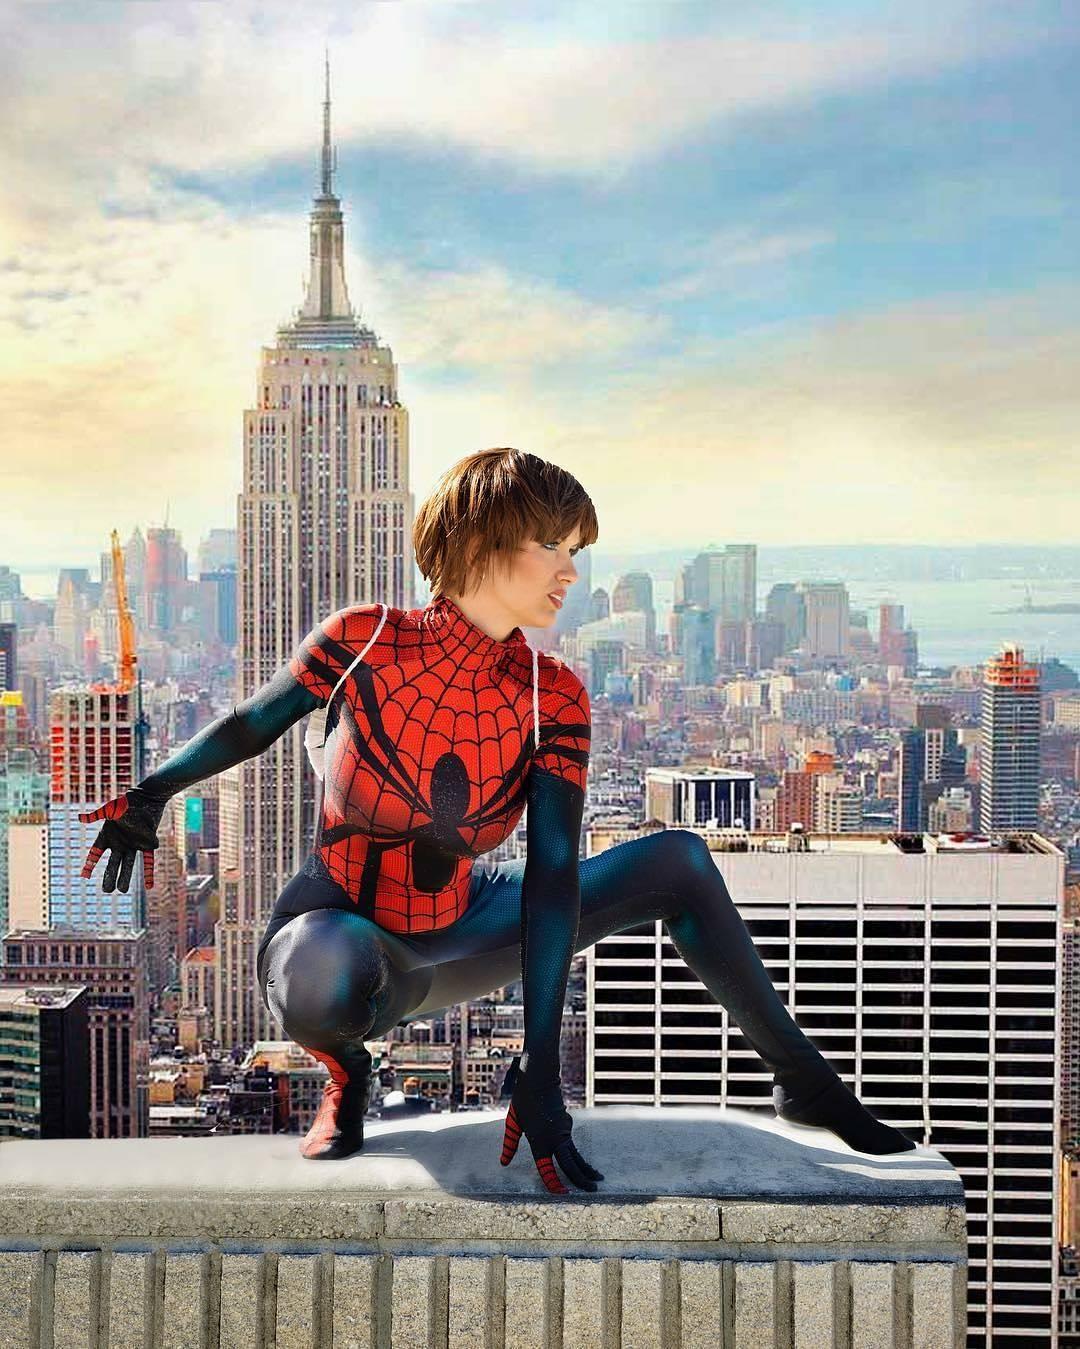 maydayparker spiderman cosplay erikacosplay photo by aflawlessimage